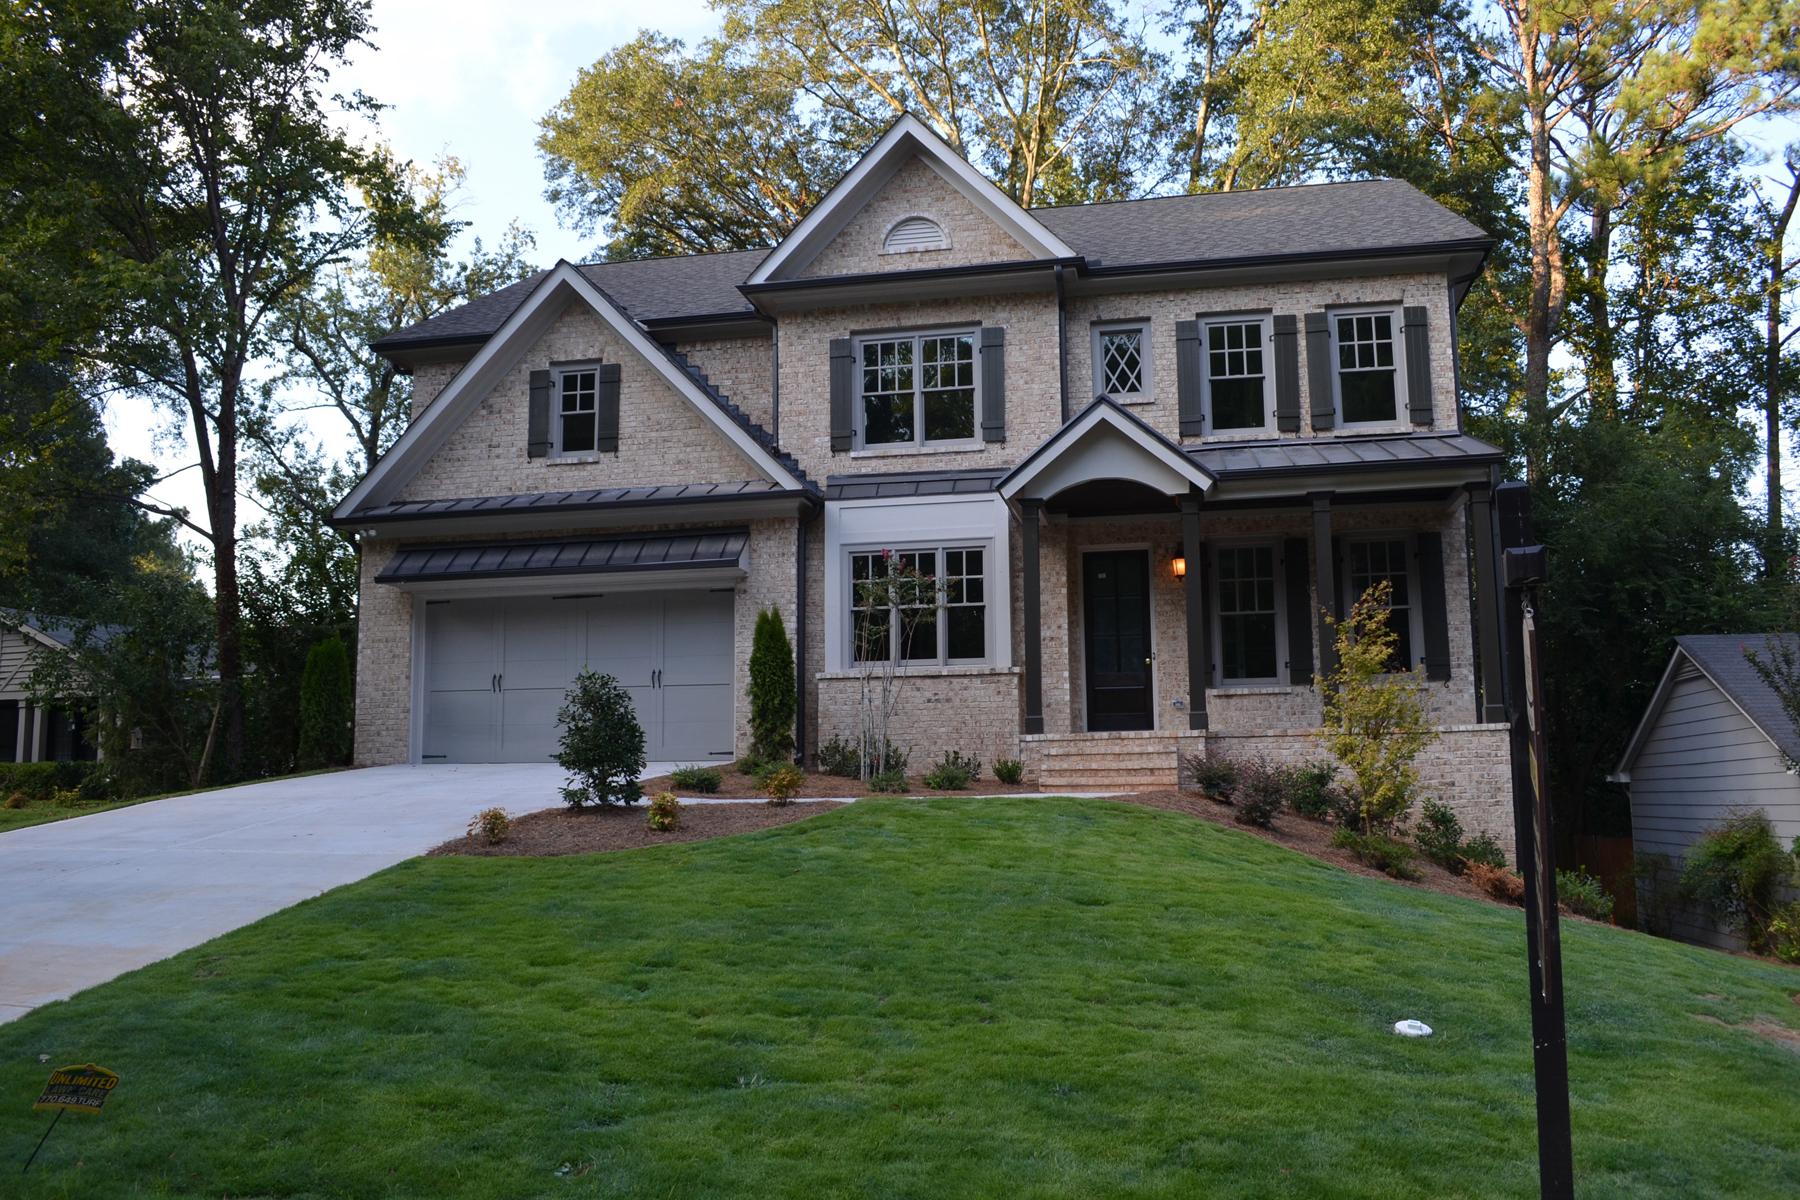 Casa para uma família para Venda às Beautiful new construction in the heart of Buckhead! 1775 Warren Court NW Atlanta, Geórgia, 30318 Estados Unidos